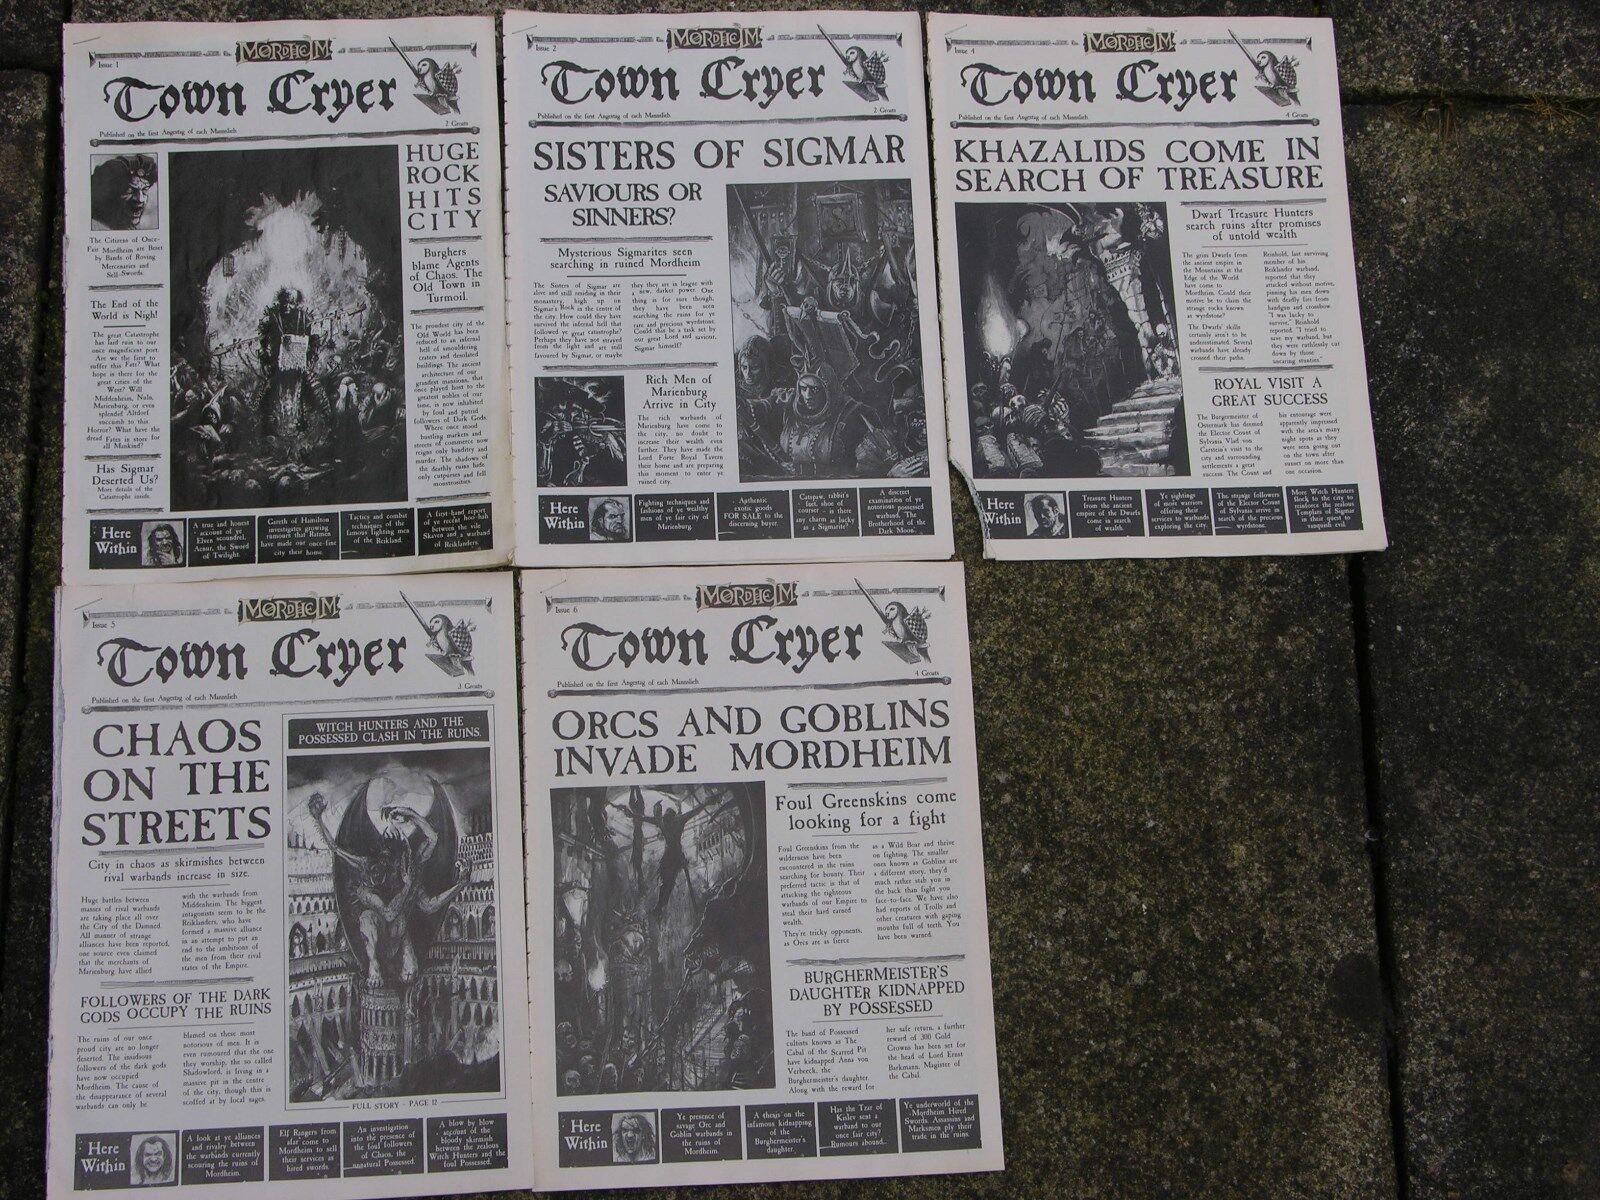 MORDHEIM TOWN CRYER, ORIGINAL ISSUES, ULTRA RARE